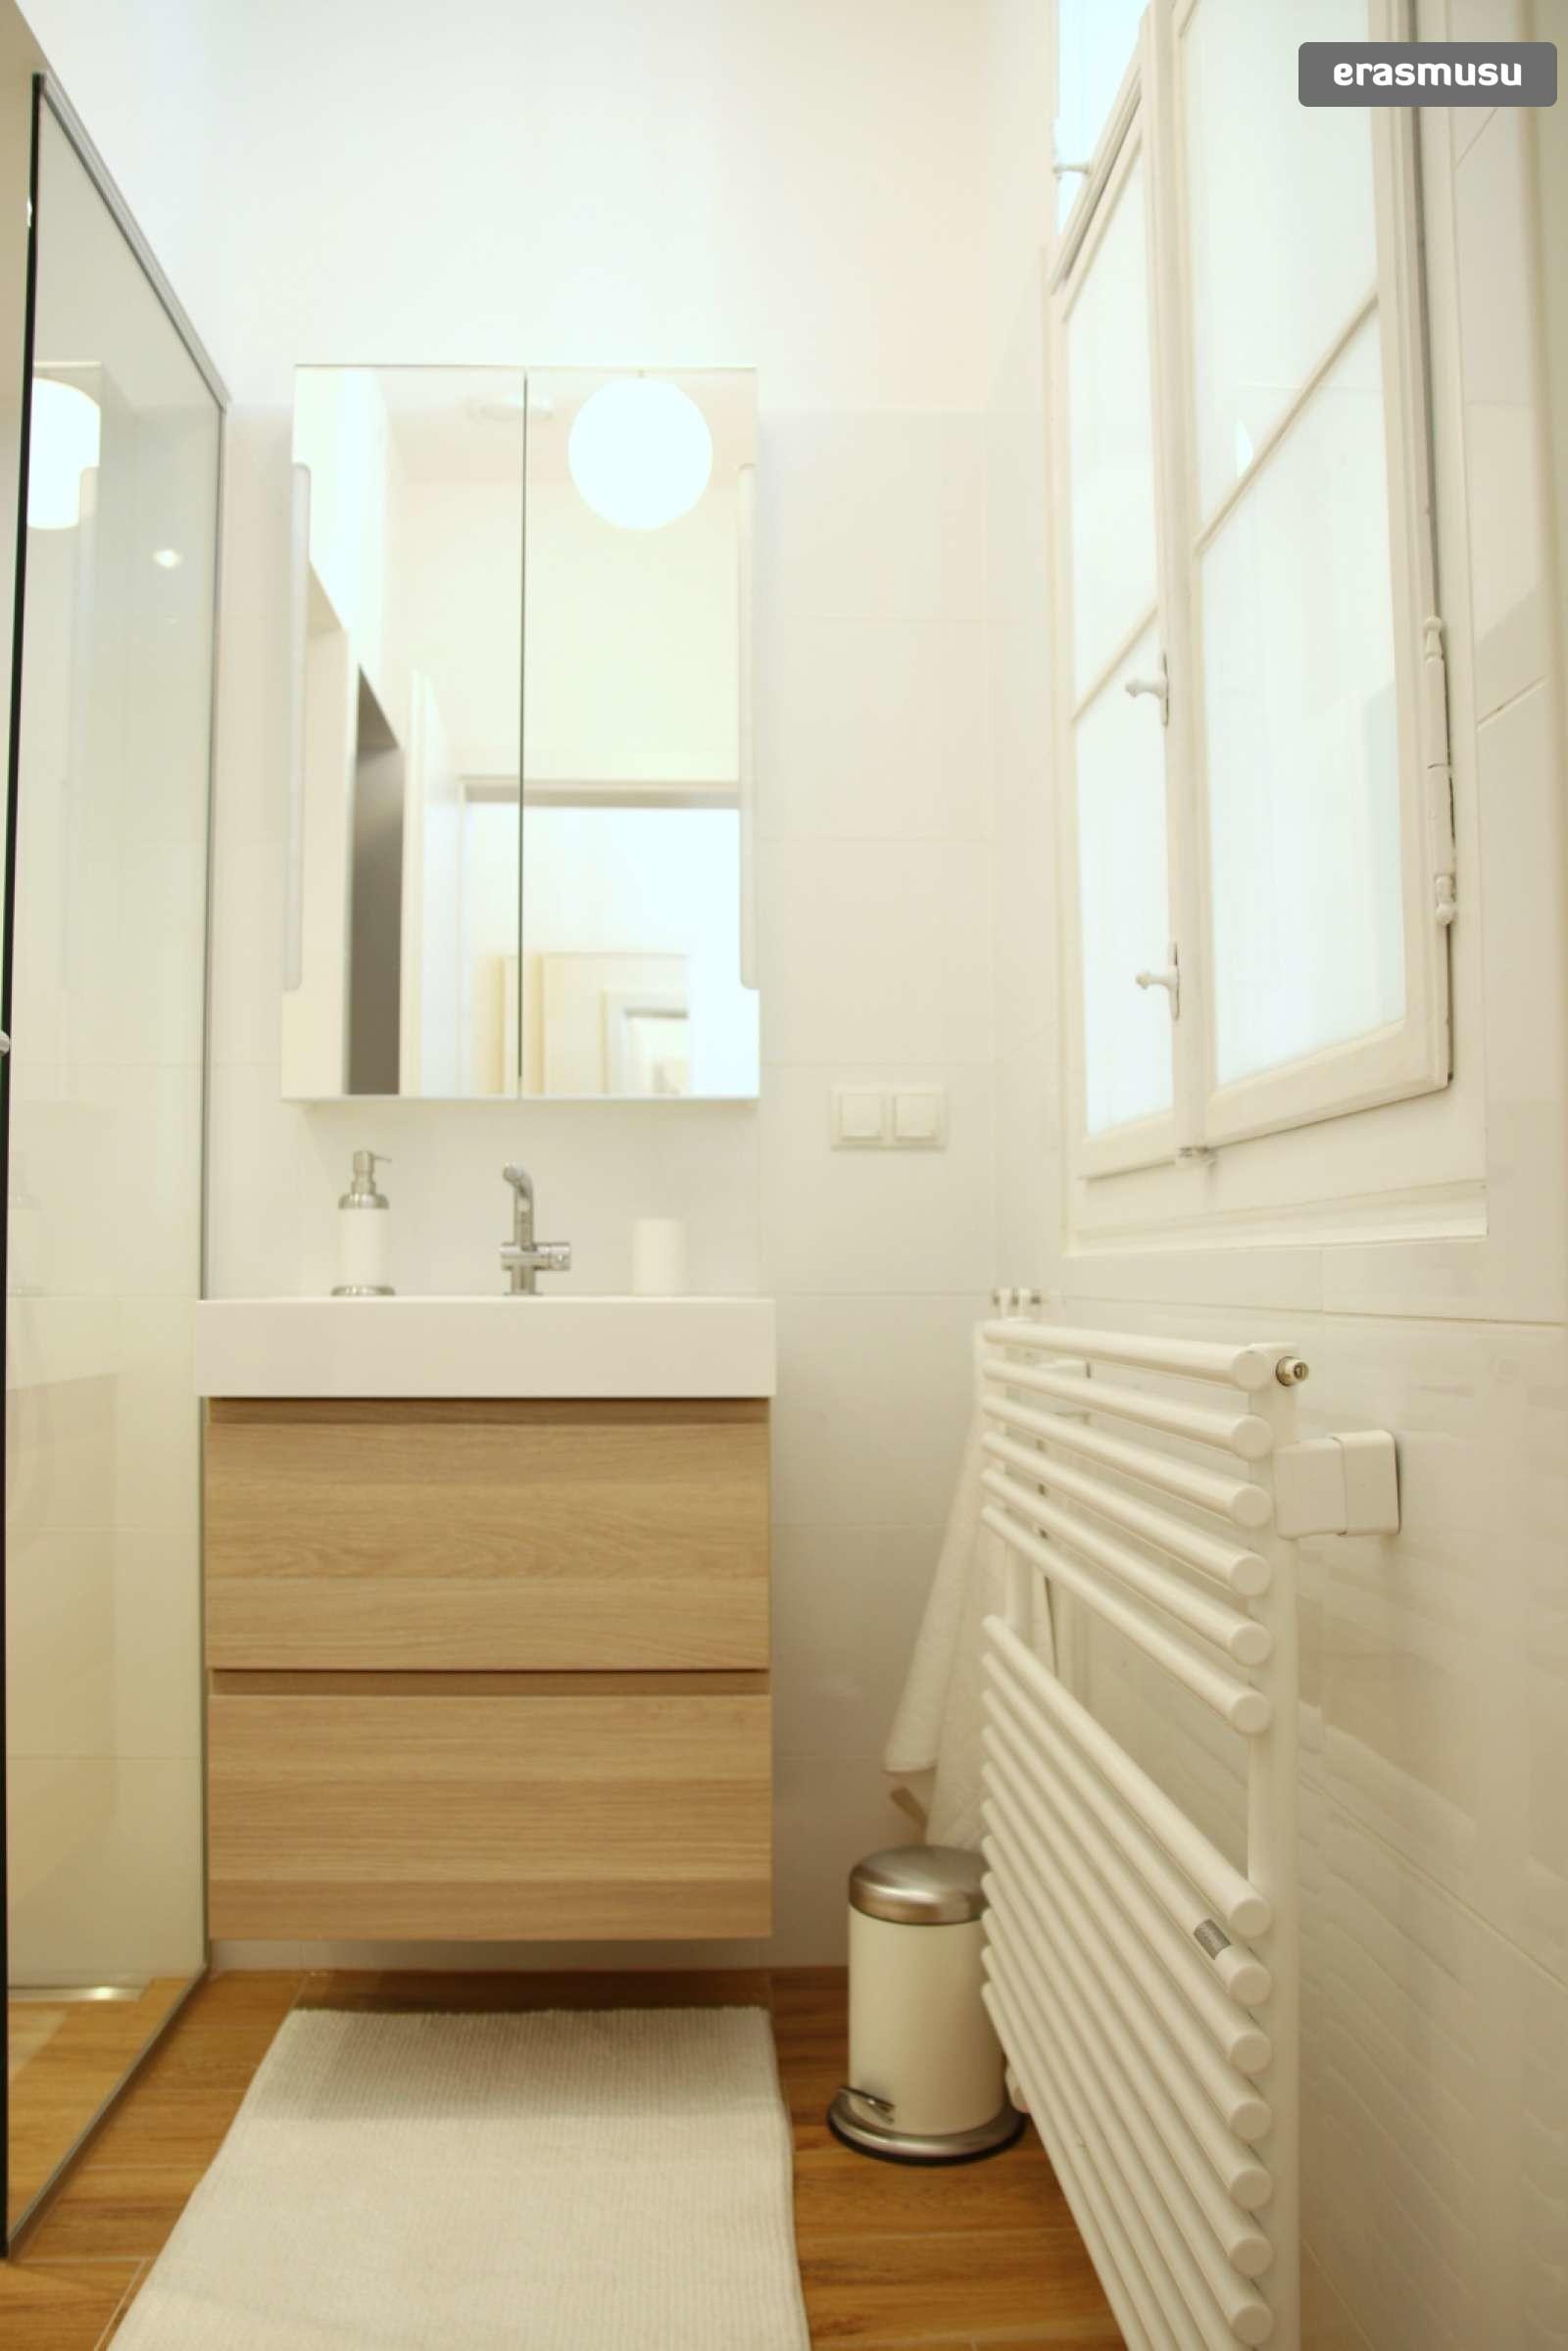 lovely-studio-apartment-rent-wahring-a2a0da2eb1d475b8f51c59ac38c